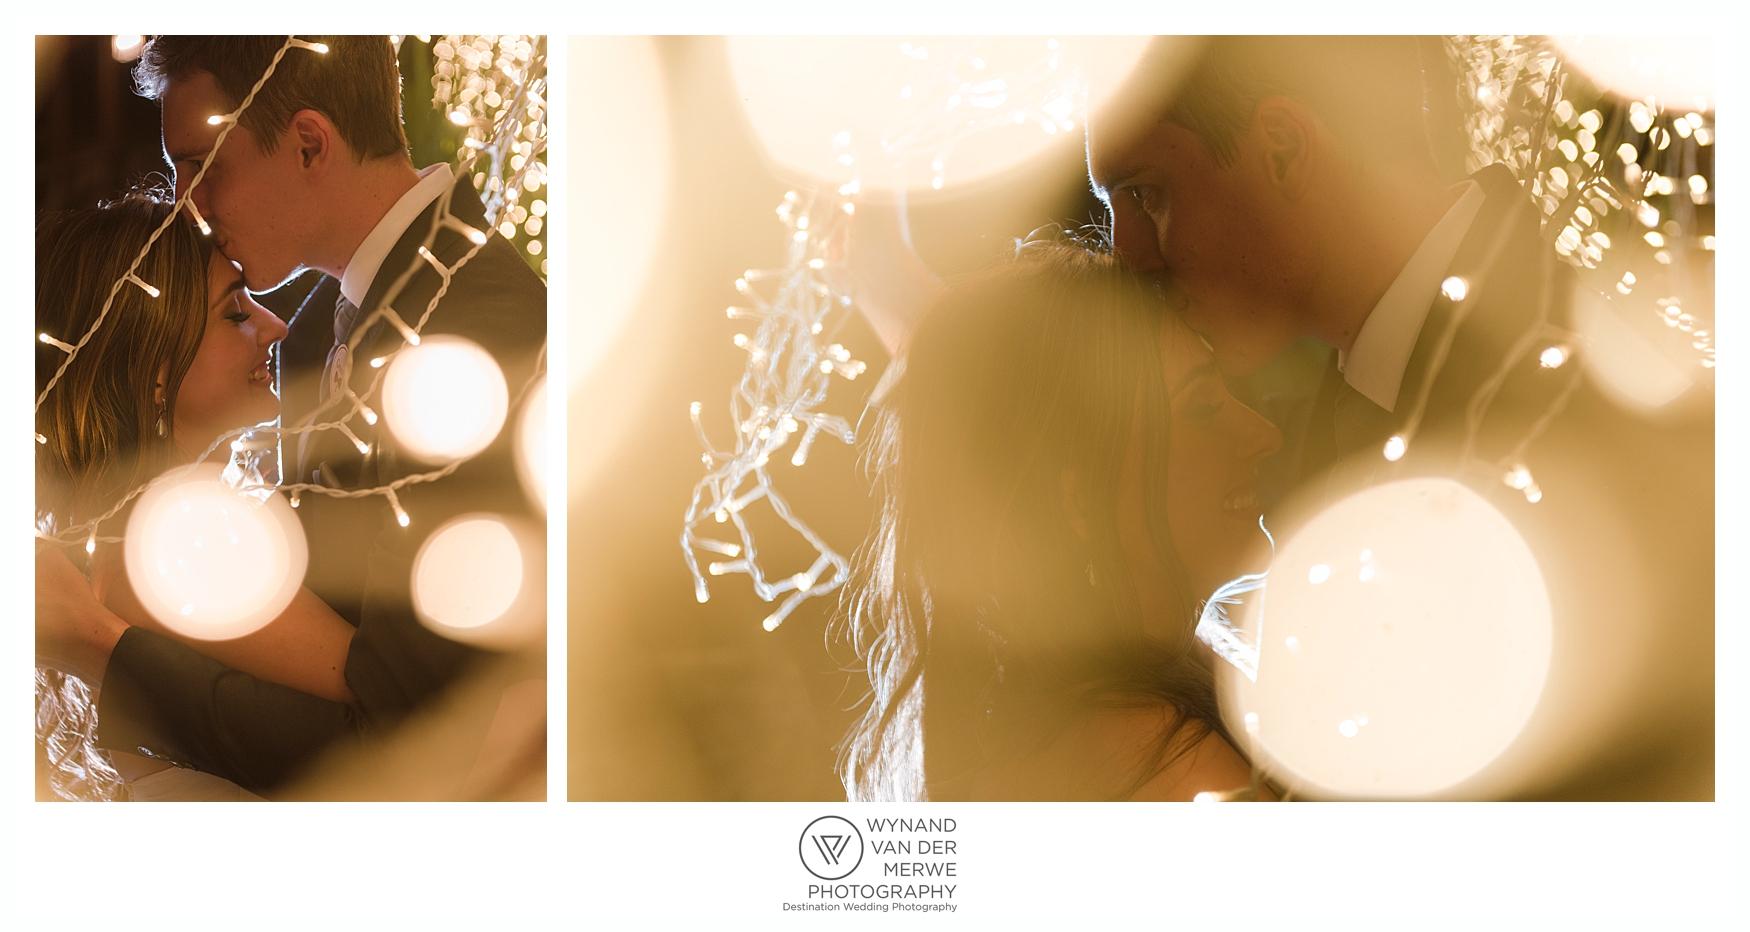 Wynandvandermerwe ryan natalia wedding photography cradle valley guesthouse gauteng-723.jpg